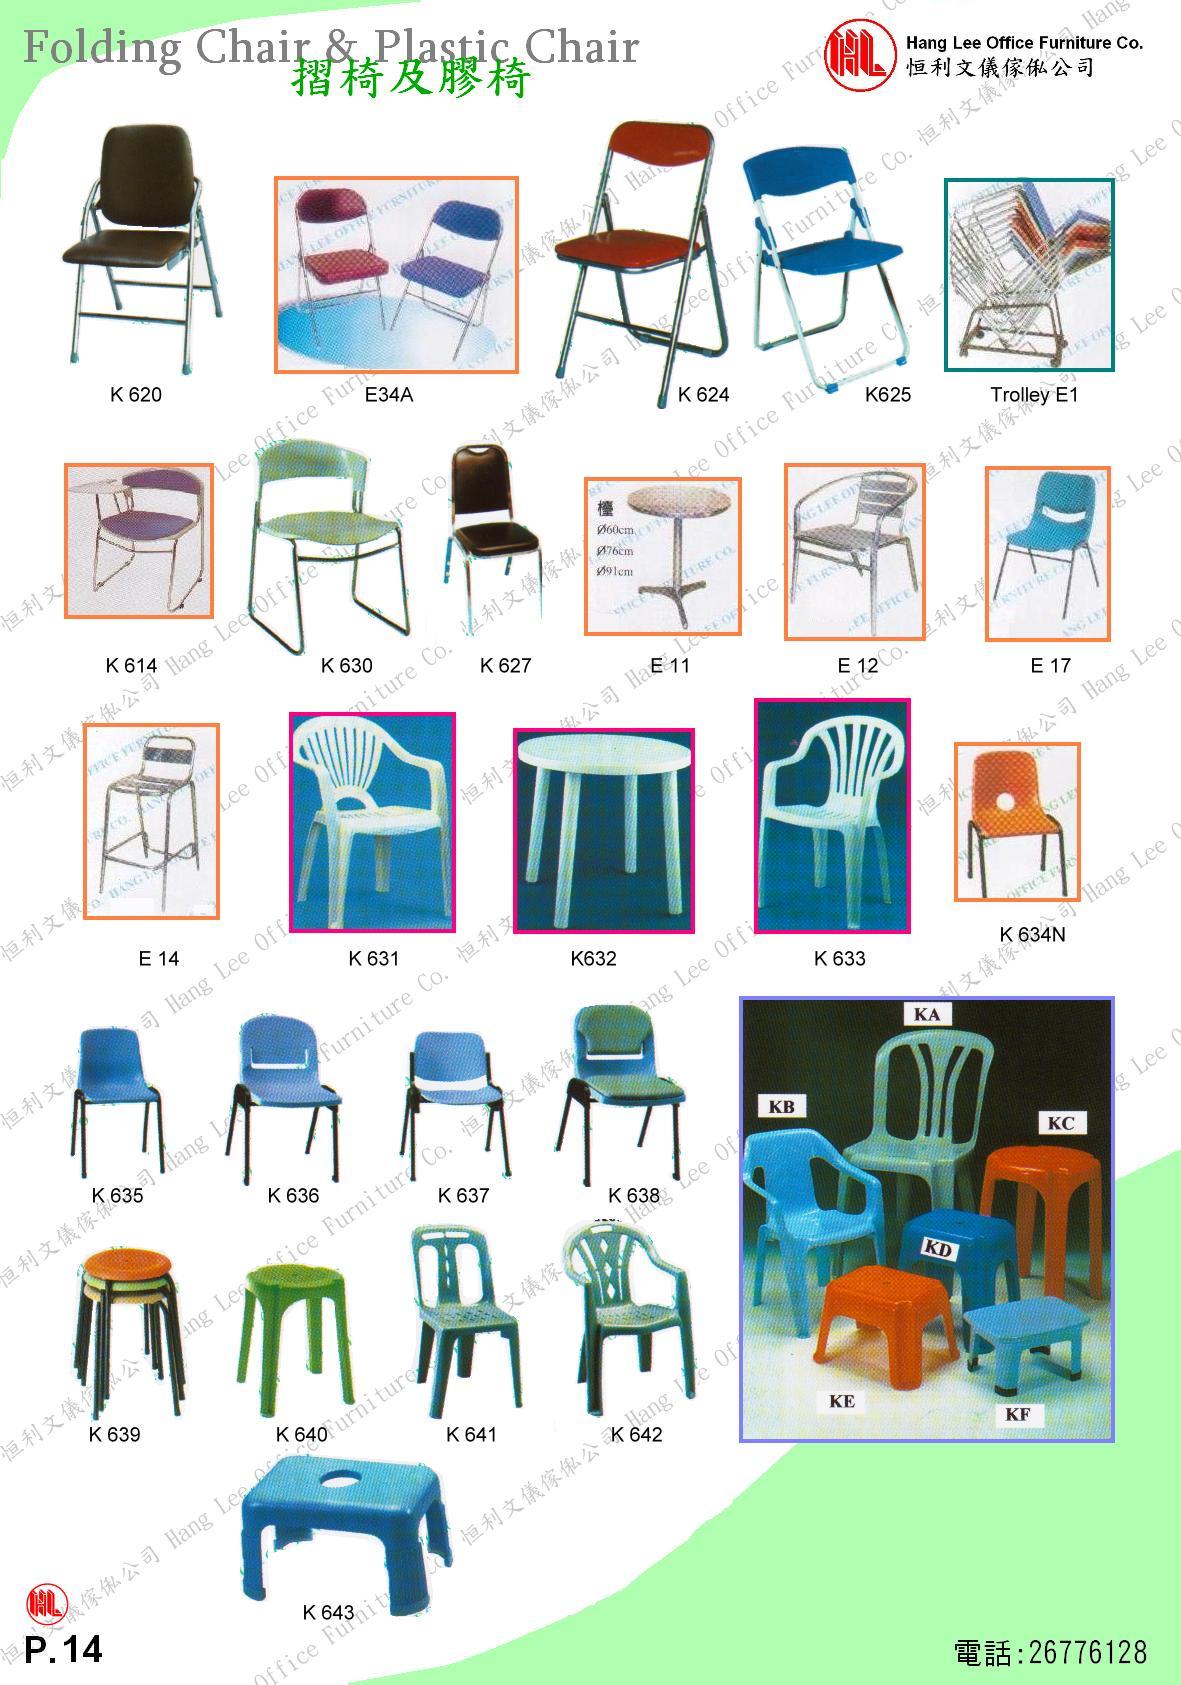 摺椅 Amp 膠椅 Folding Chair Amp Plastic Chair